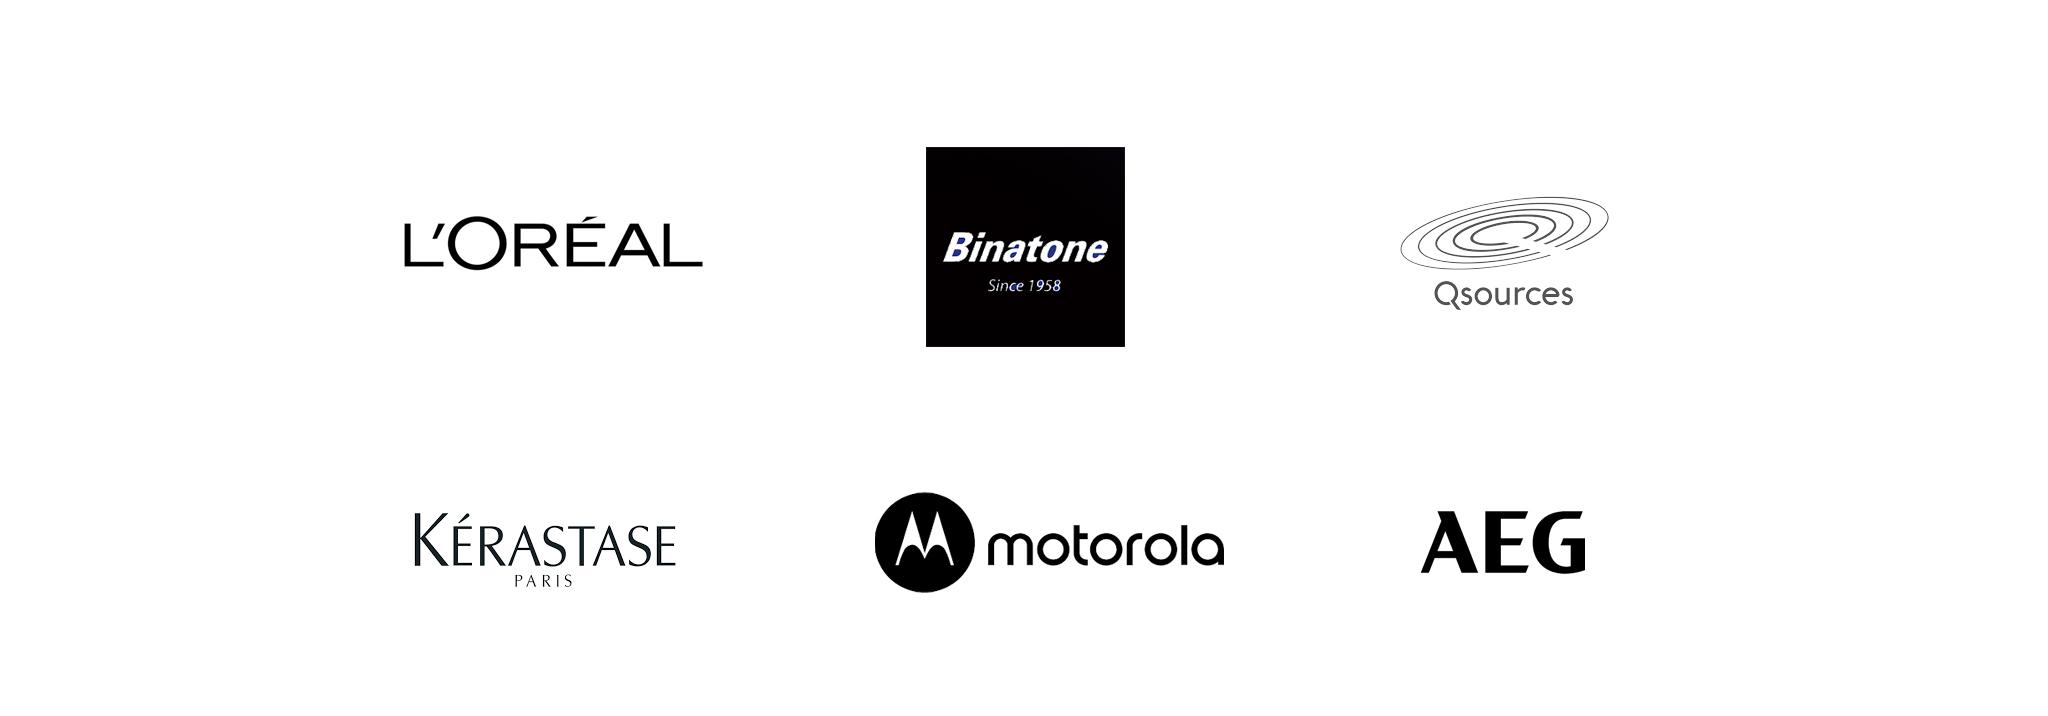 logos bedrijven